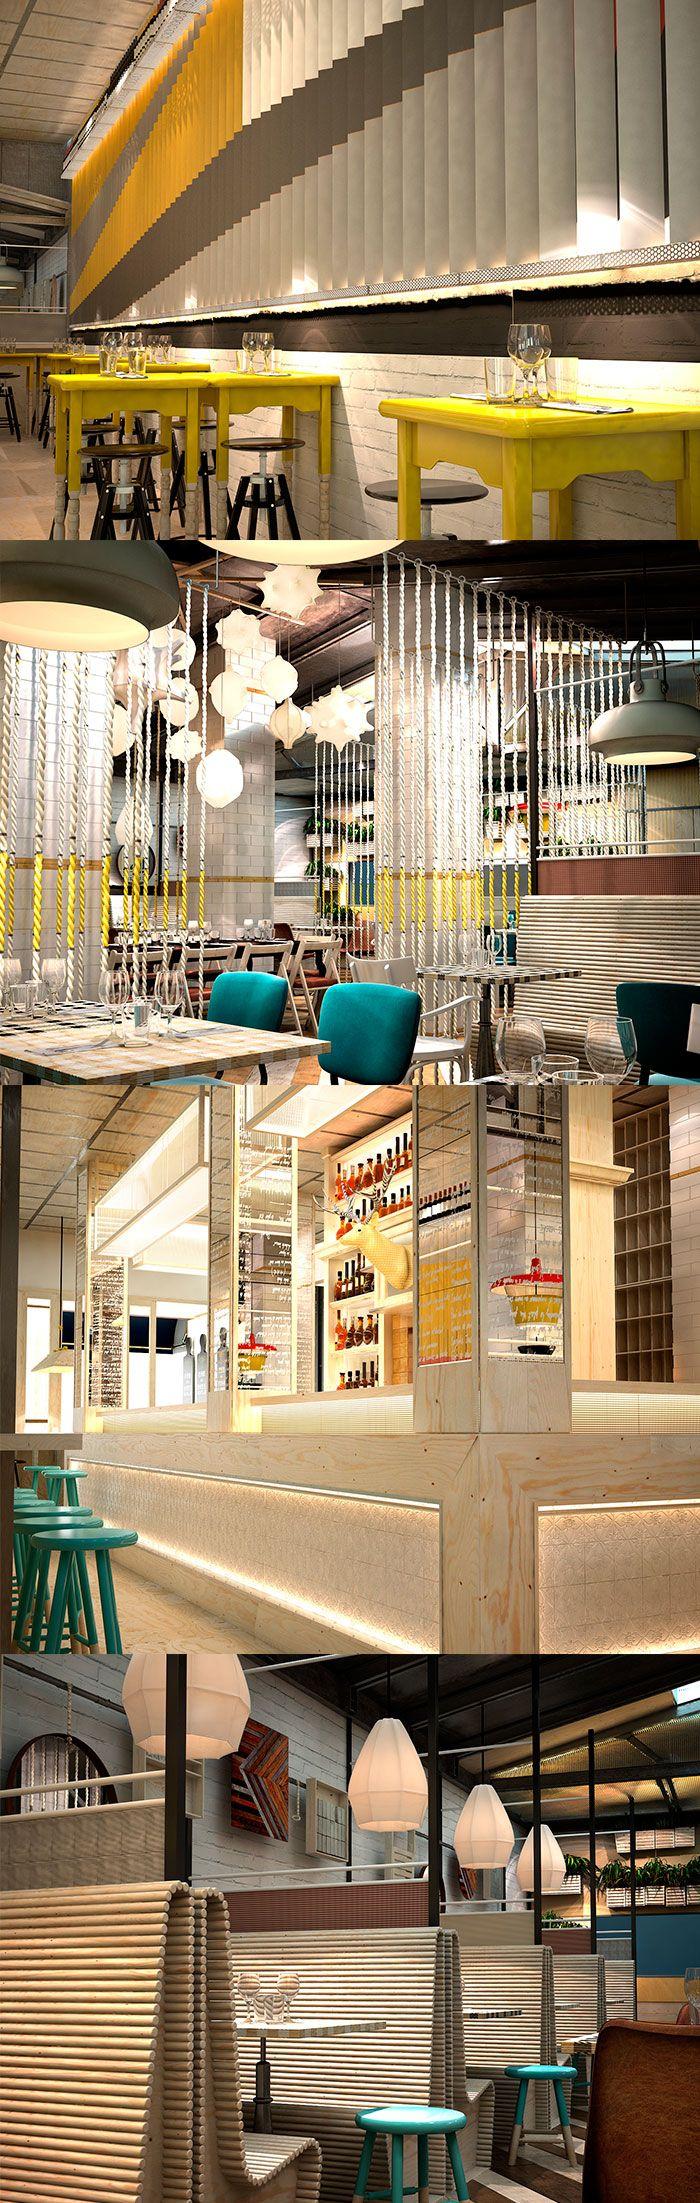 Morimoto Restaurant- a sophisticated interior design by Schoos Group